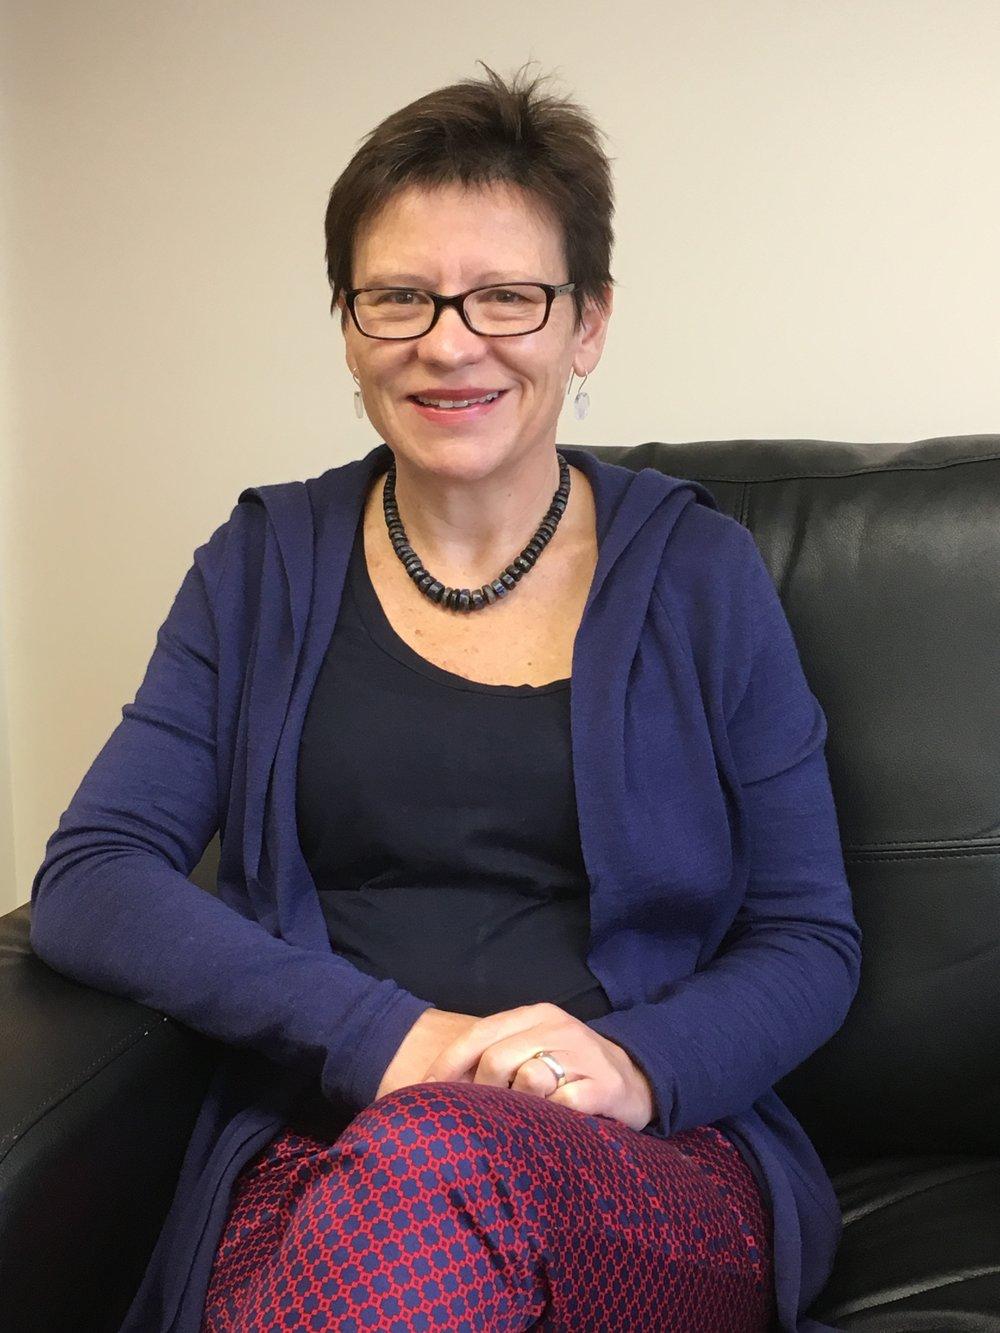 Judith McDonald